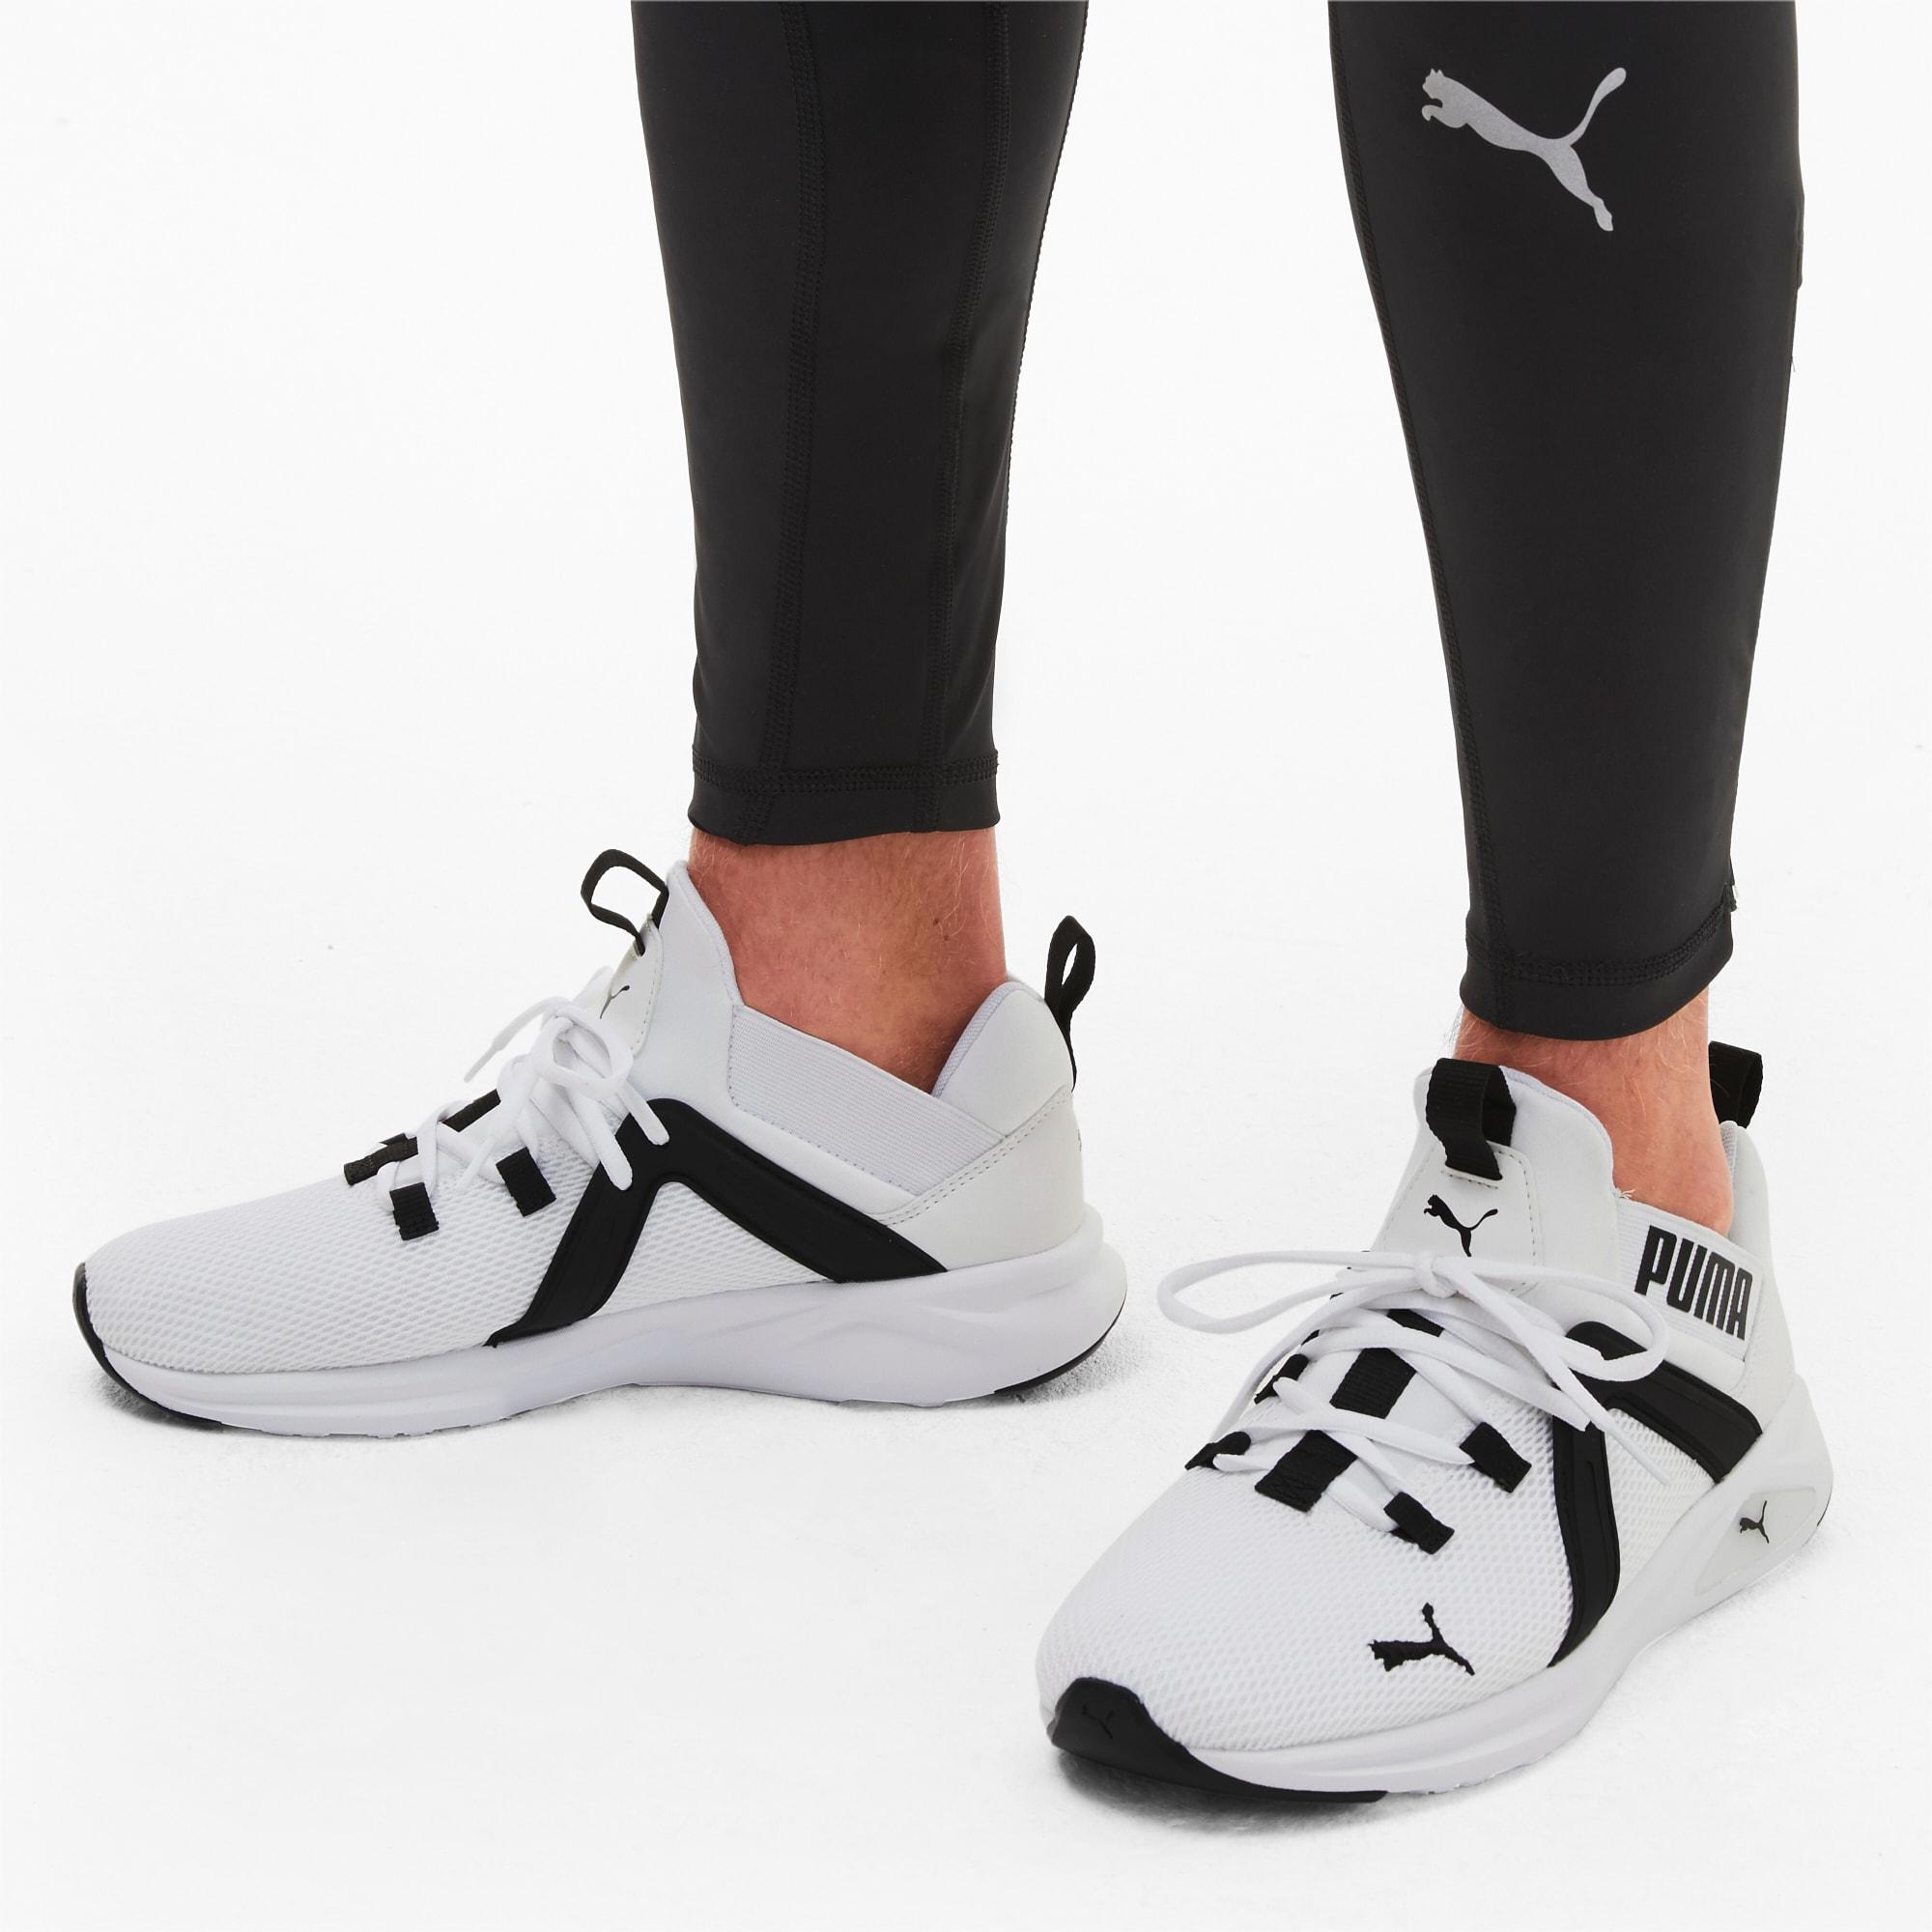 Enzo 2 Men's Training Shoes